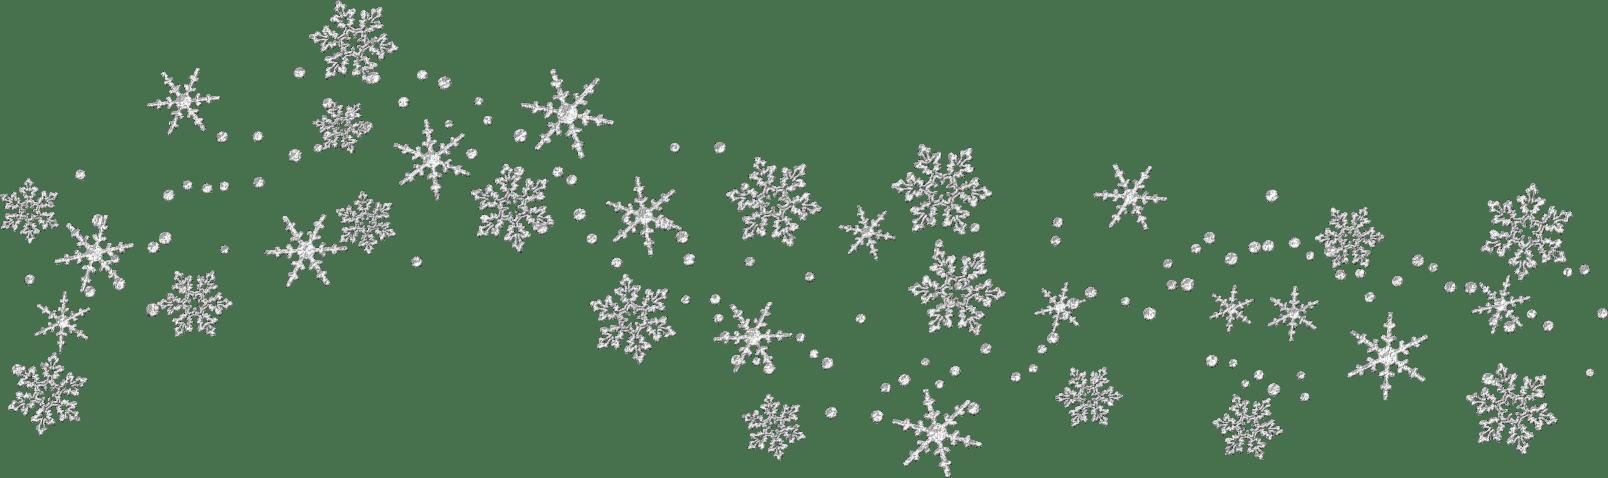 Free Transparent Snowflake Border, Download Free Clip Art.